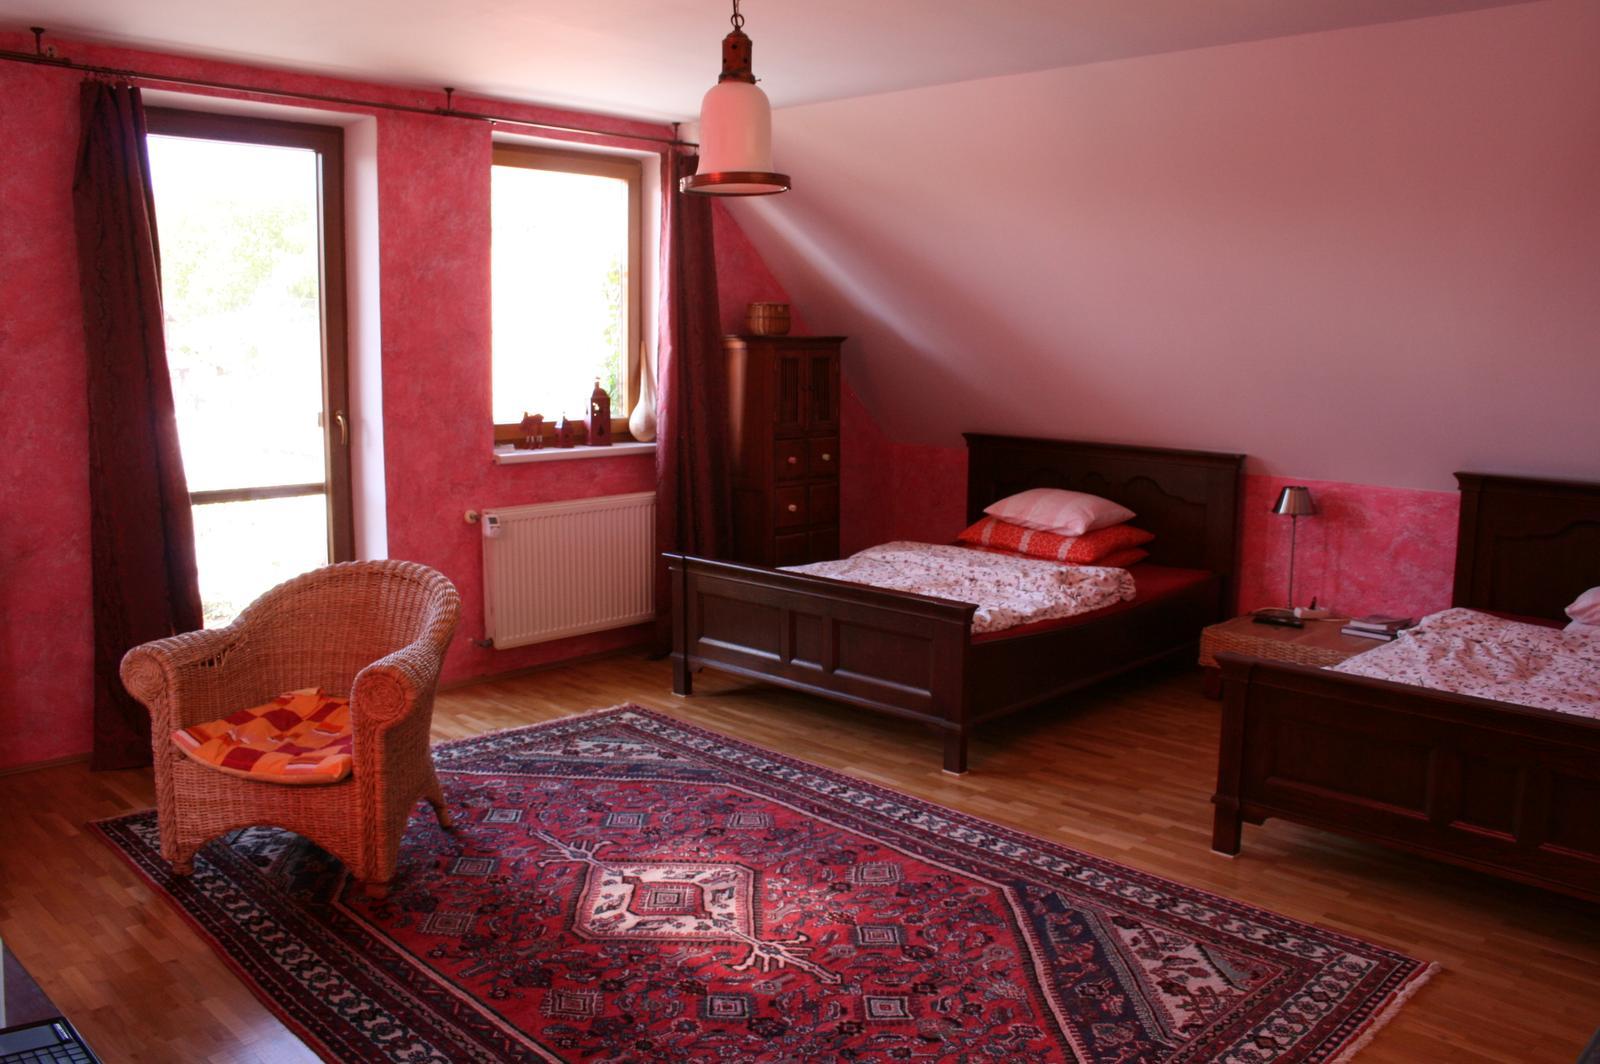 Naša spálňa - Obrázok č. 2